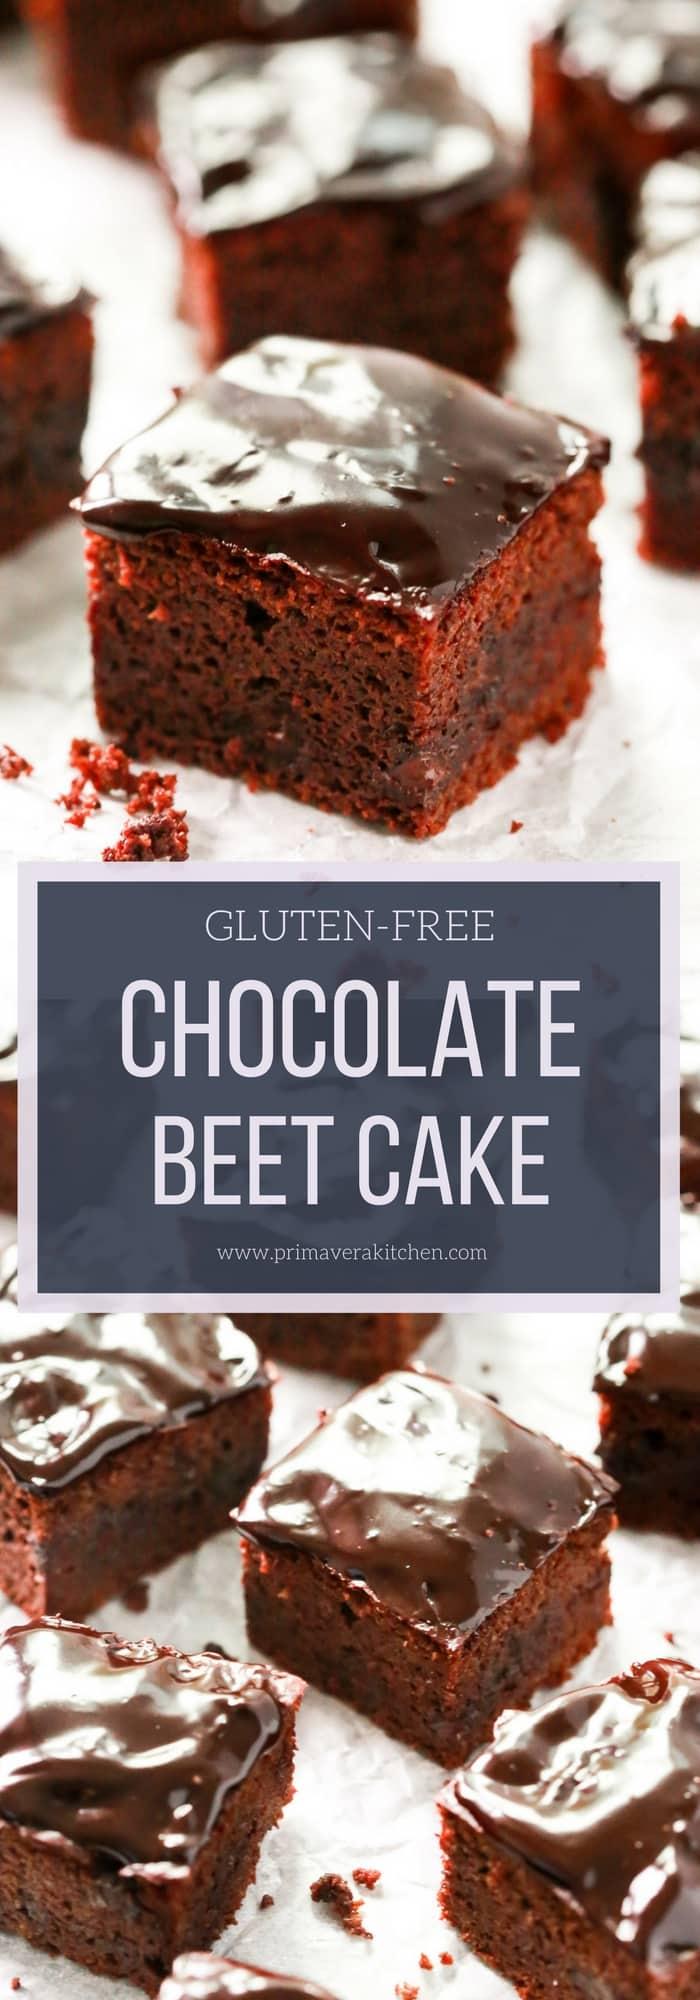 Gluten-free Chocolate Beet Cake